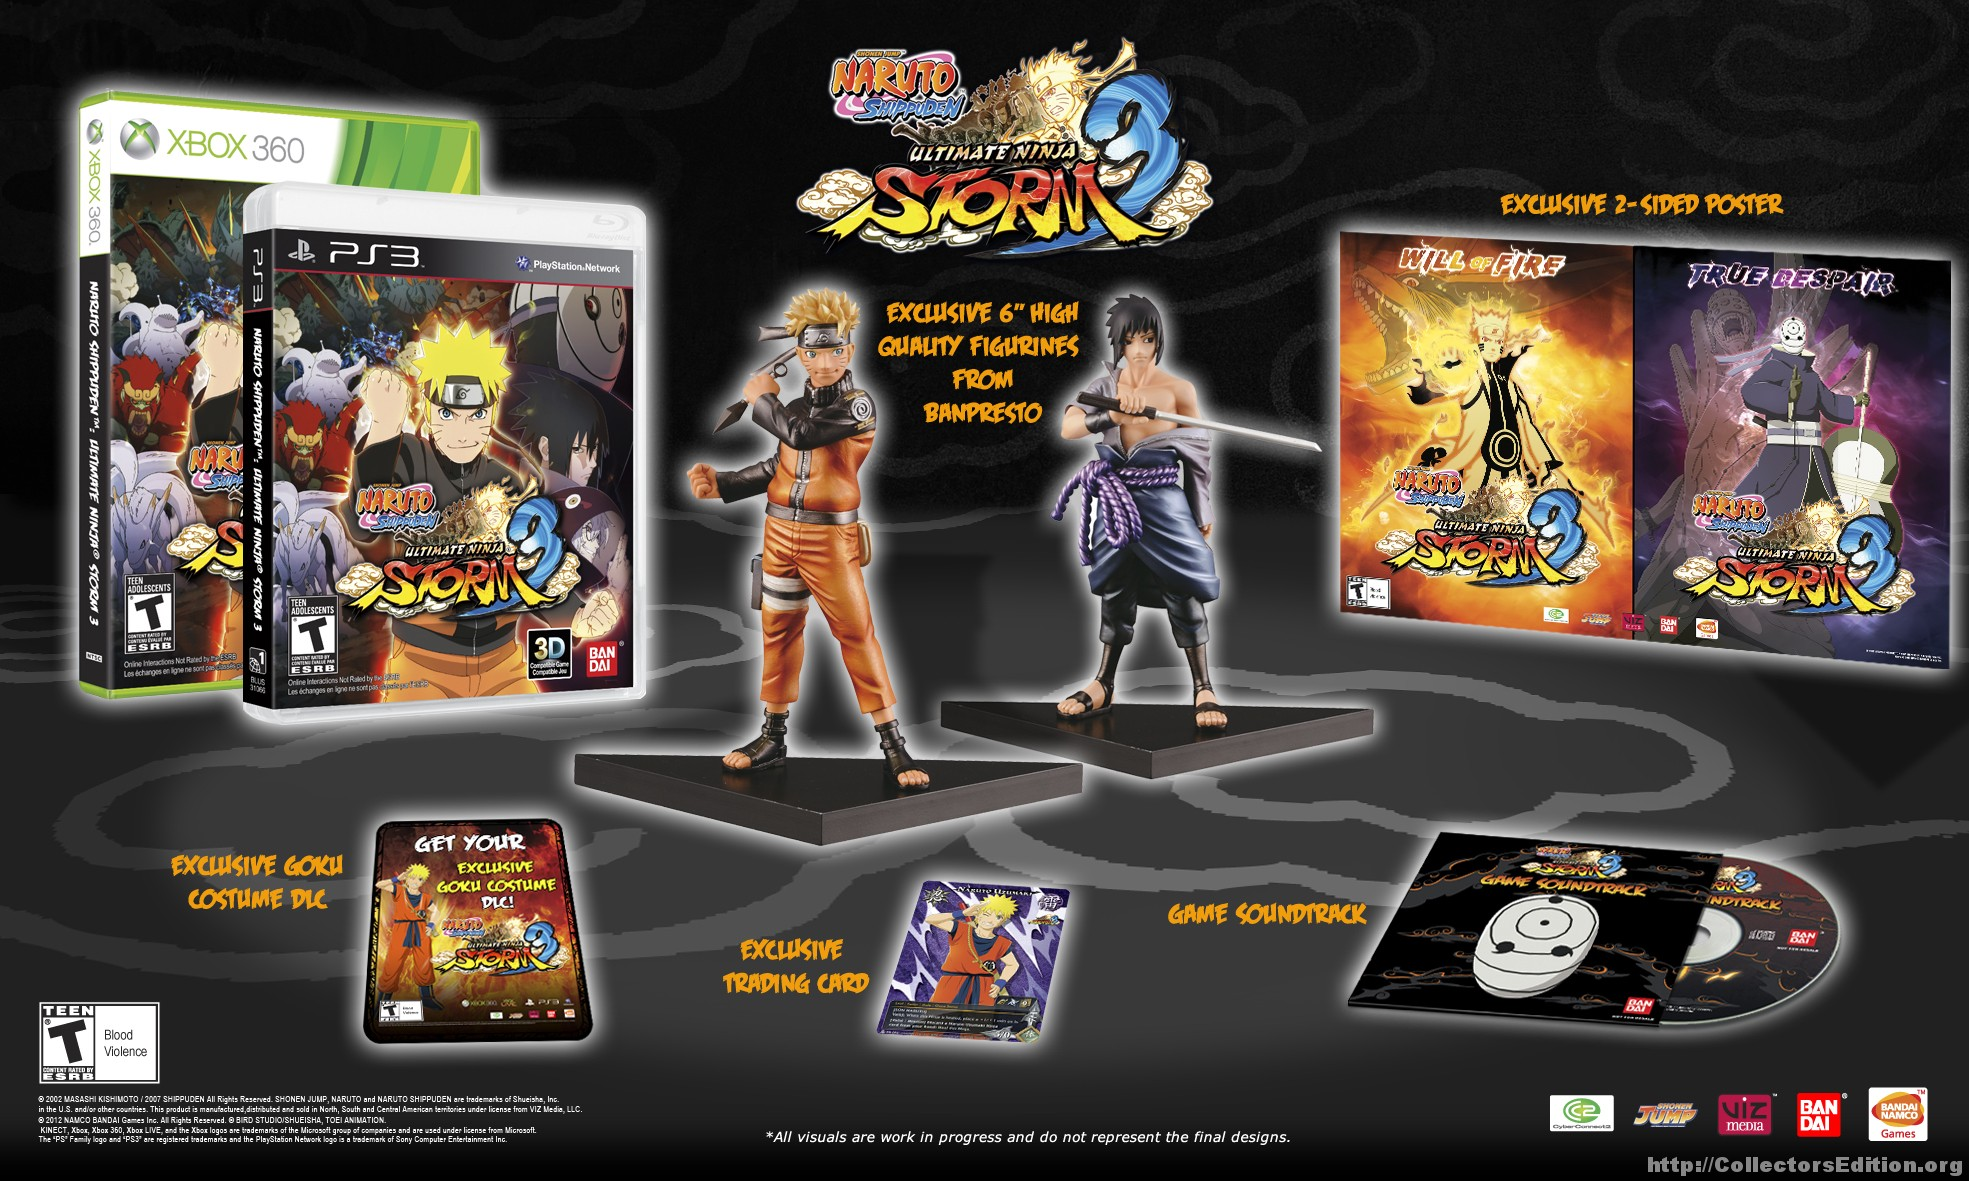 CollectorsEdition org » Naruto Shippuden Ultimate Ninja Storm 3